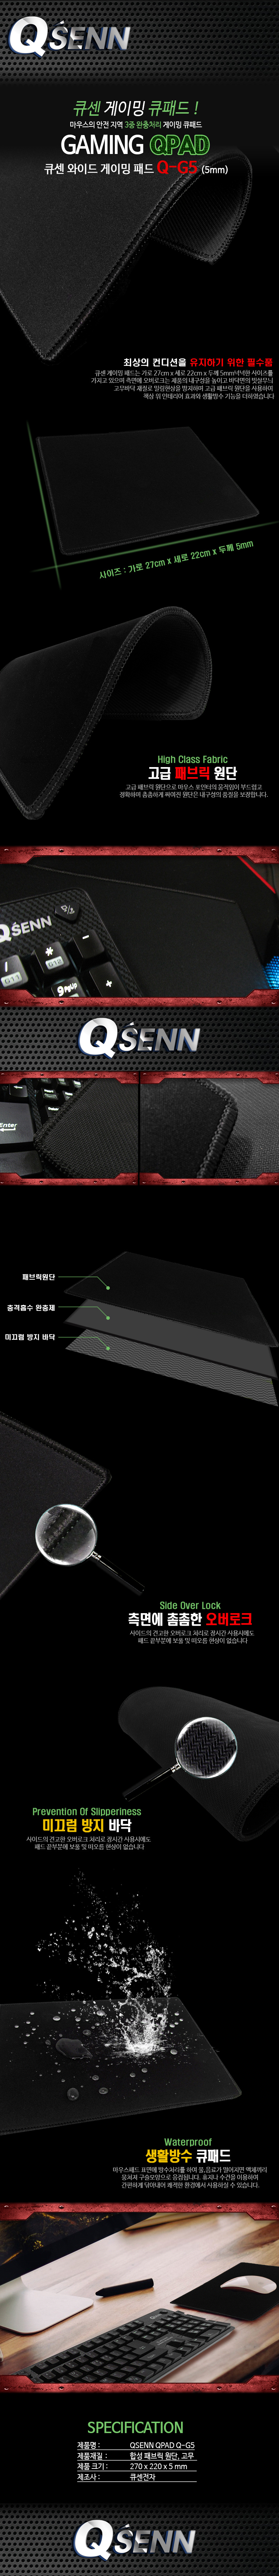 QSENN Q-G5L 게이밍 마우스 패드